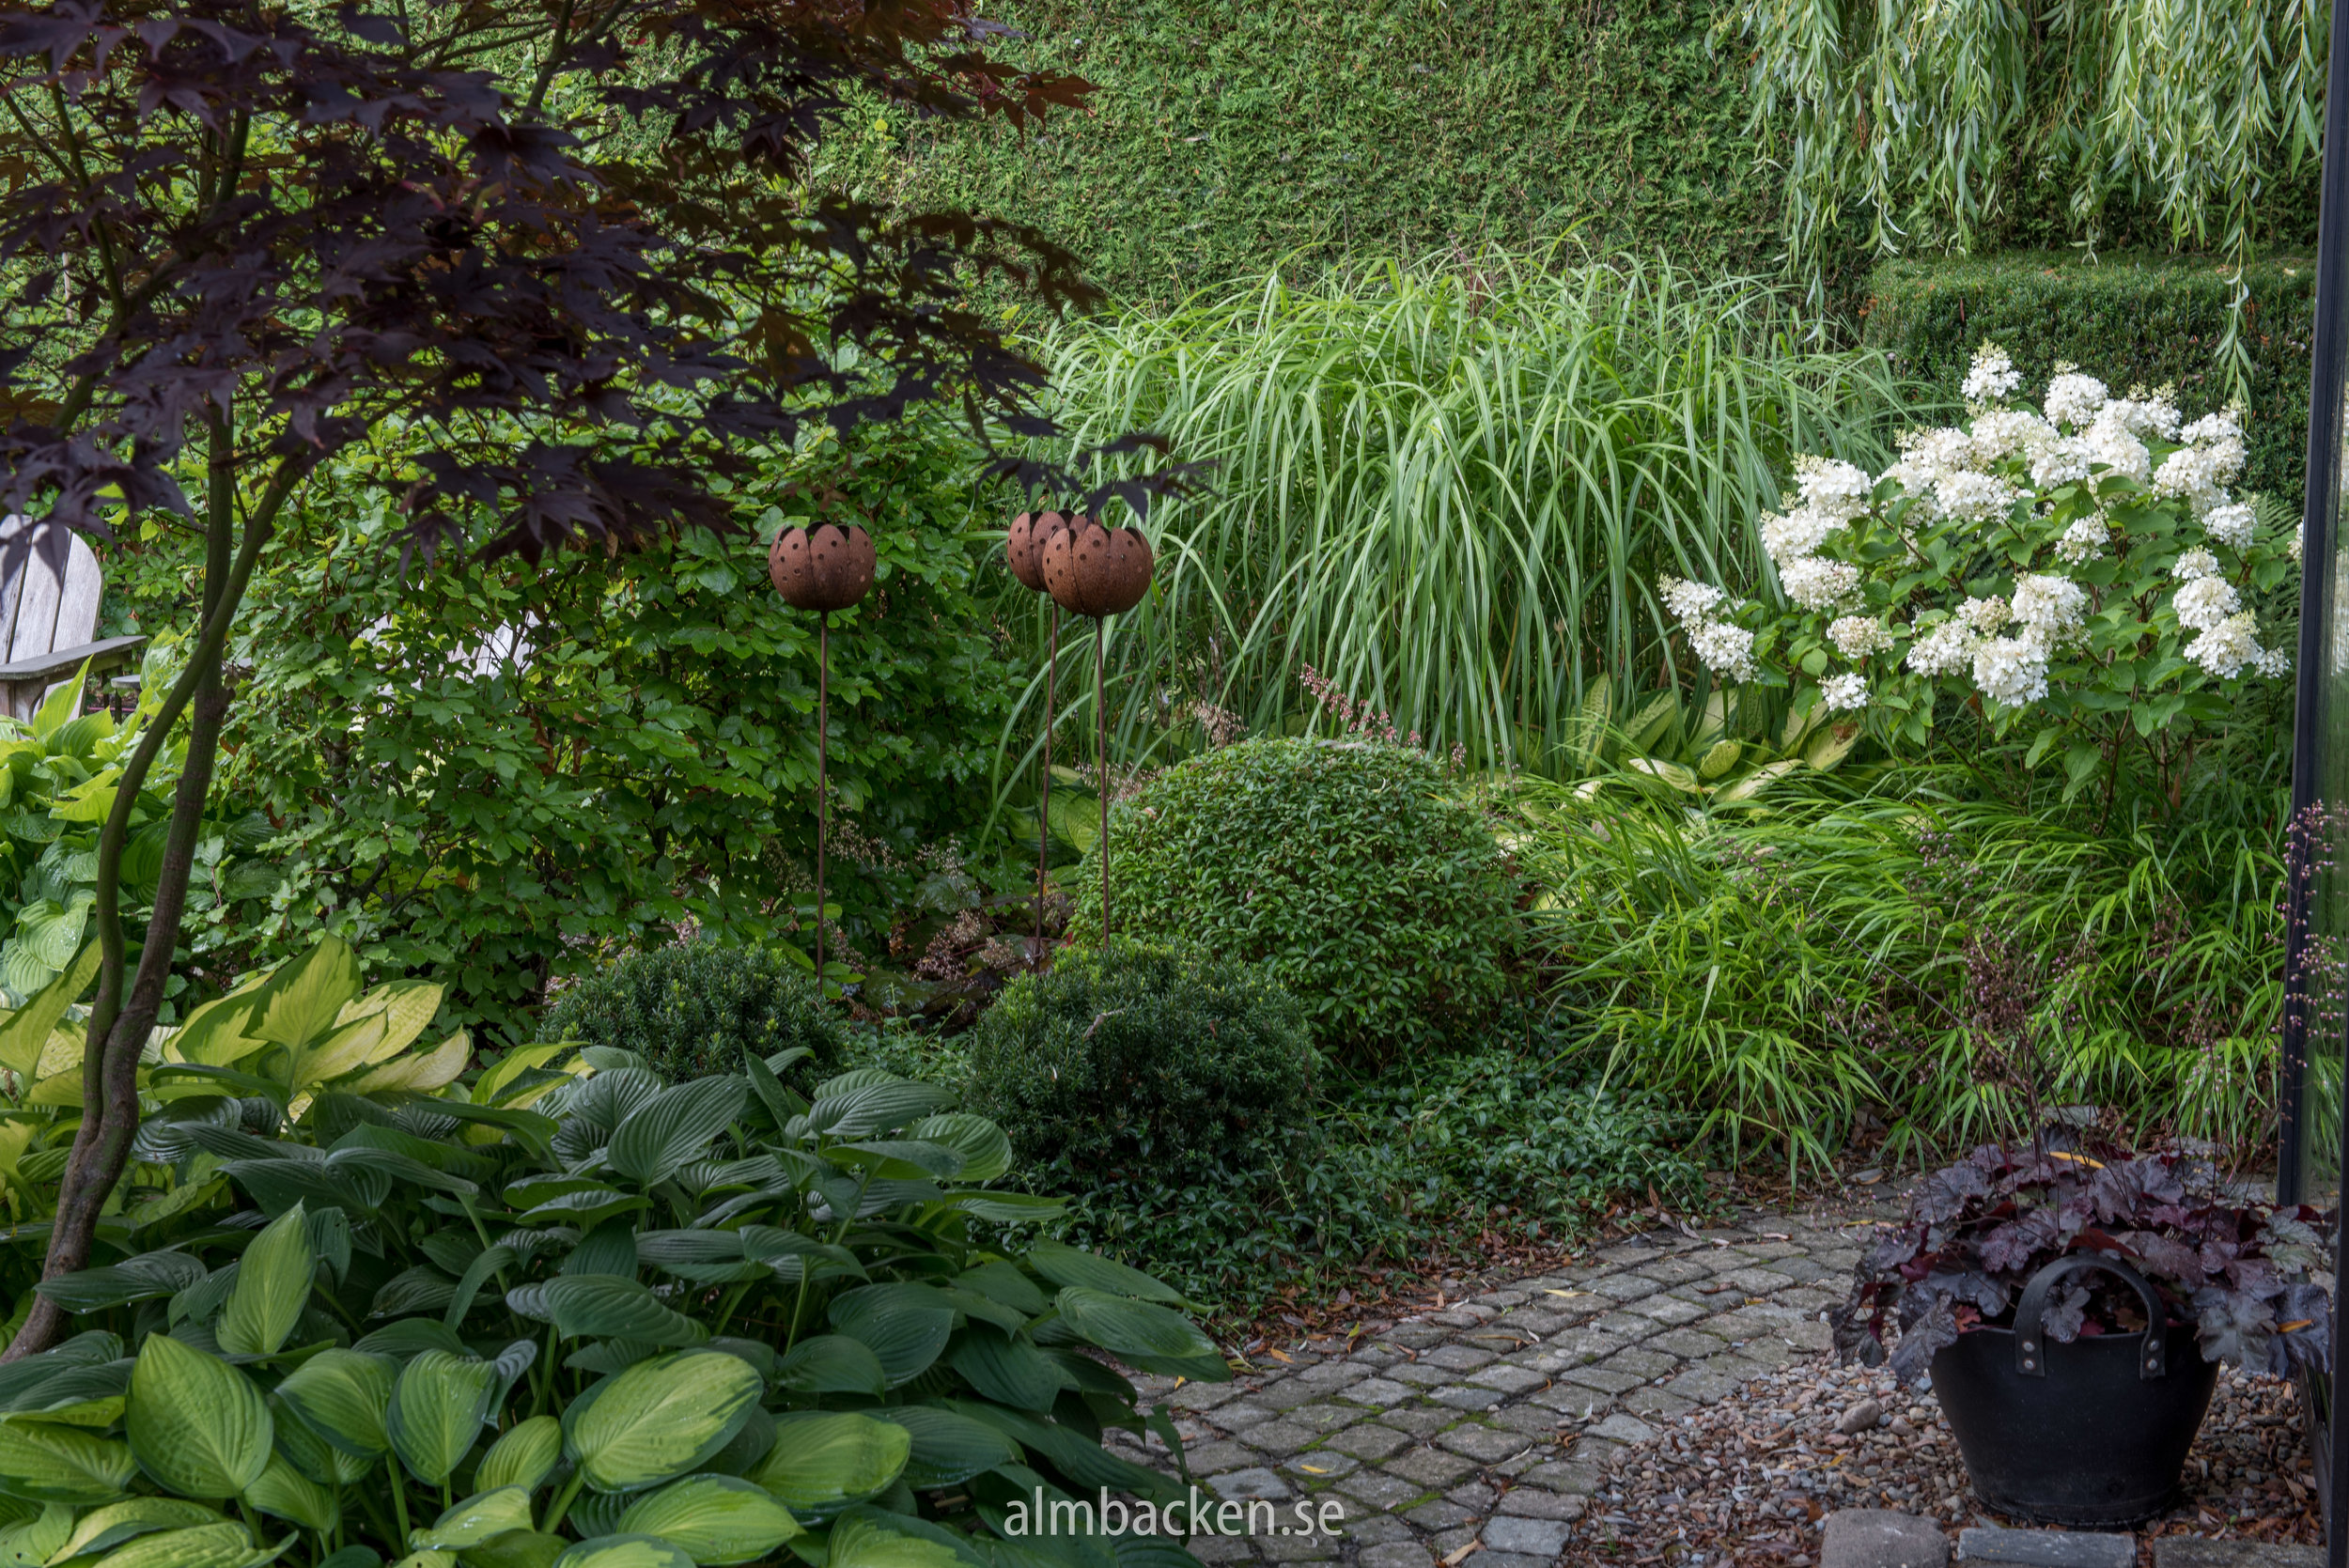 Hydrangea paniculata 'Silver Dollar', Miscanthus sinensis 'Malepartus', Hakonechola Macra, Vinca Minor, Hosta 'Gold Standard'